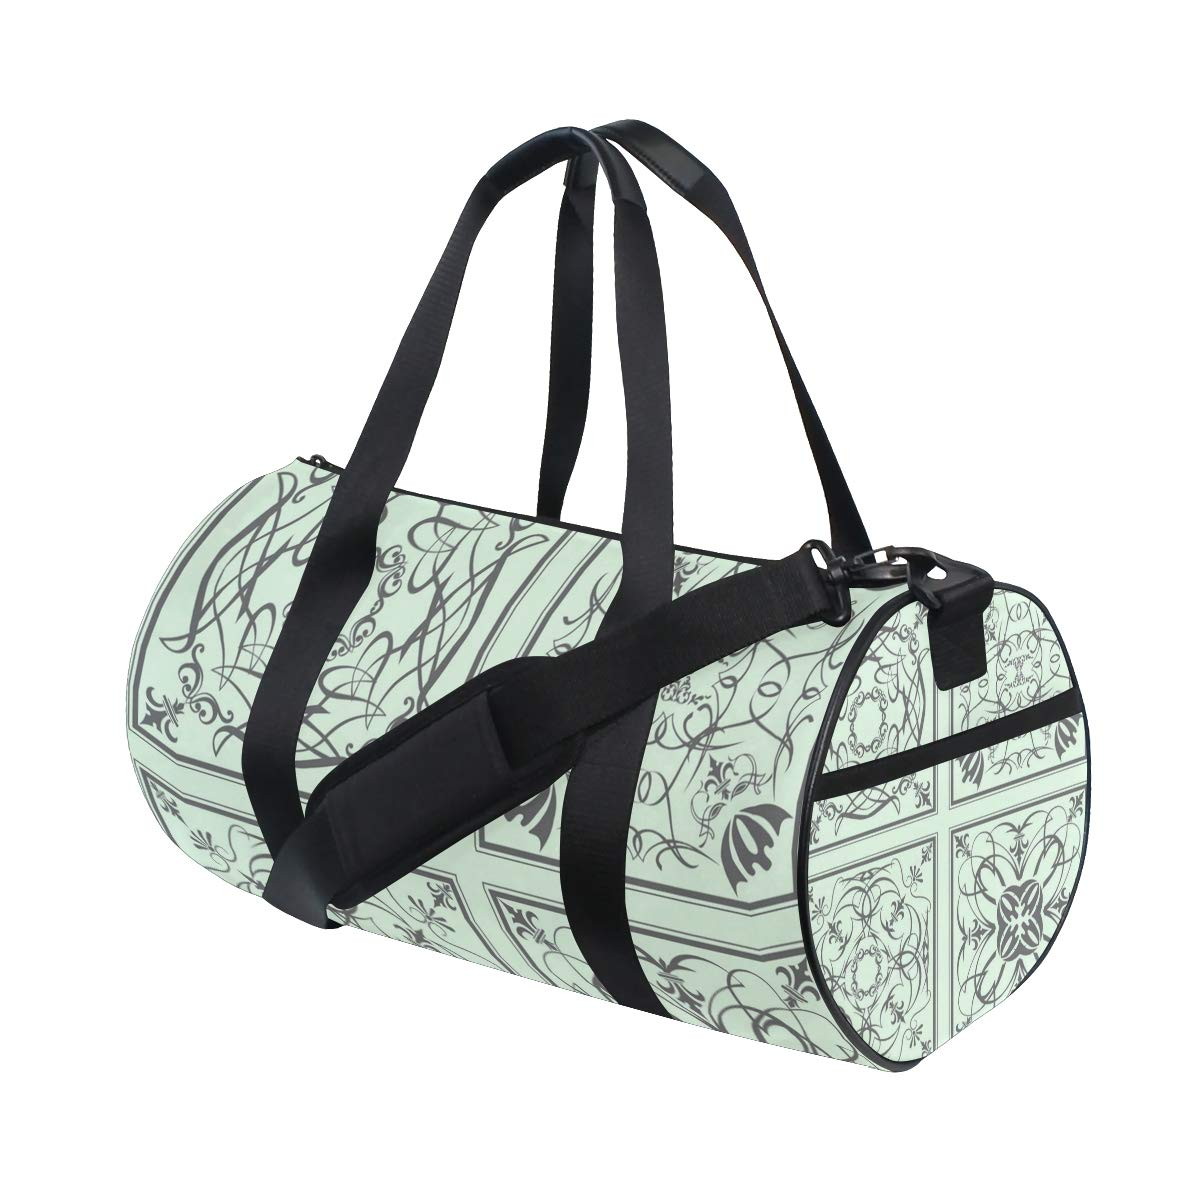 Differentiated Ceramic PictureWaterproof Non-Slip Wearable Crossbody Bag fitness bag Shoulder Bag